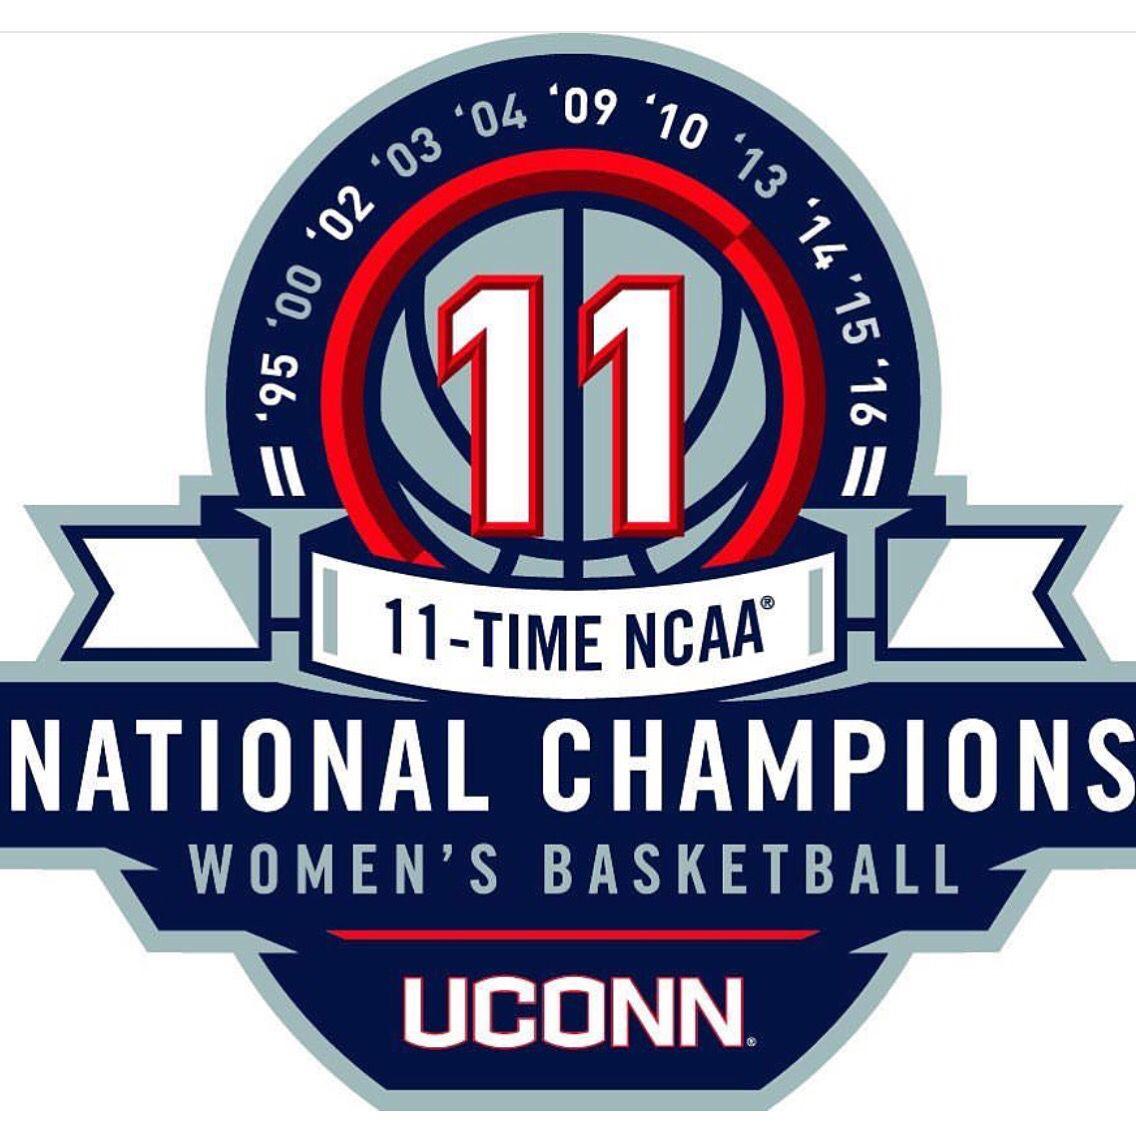 Uconn huskies women's basketball team-1057